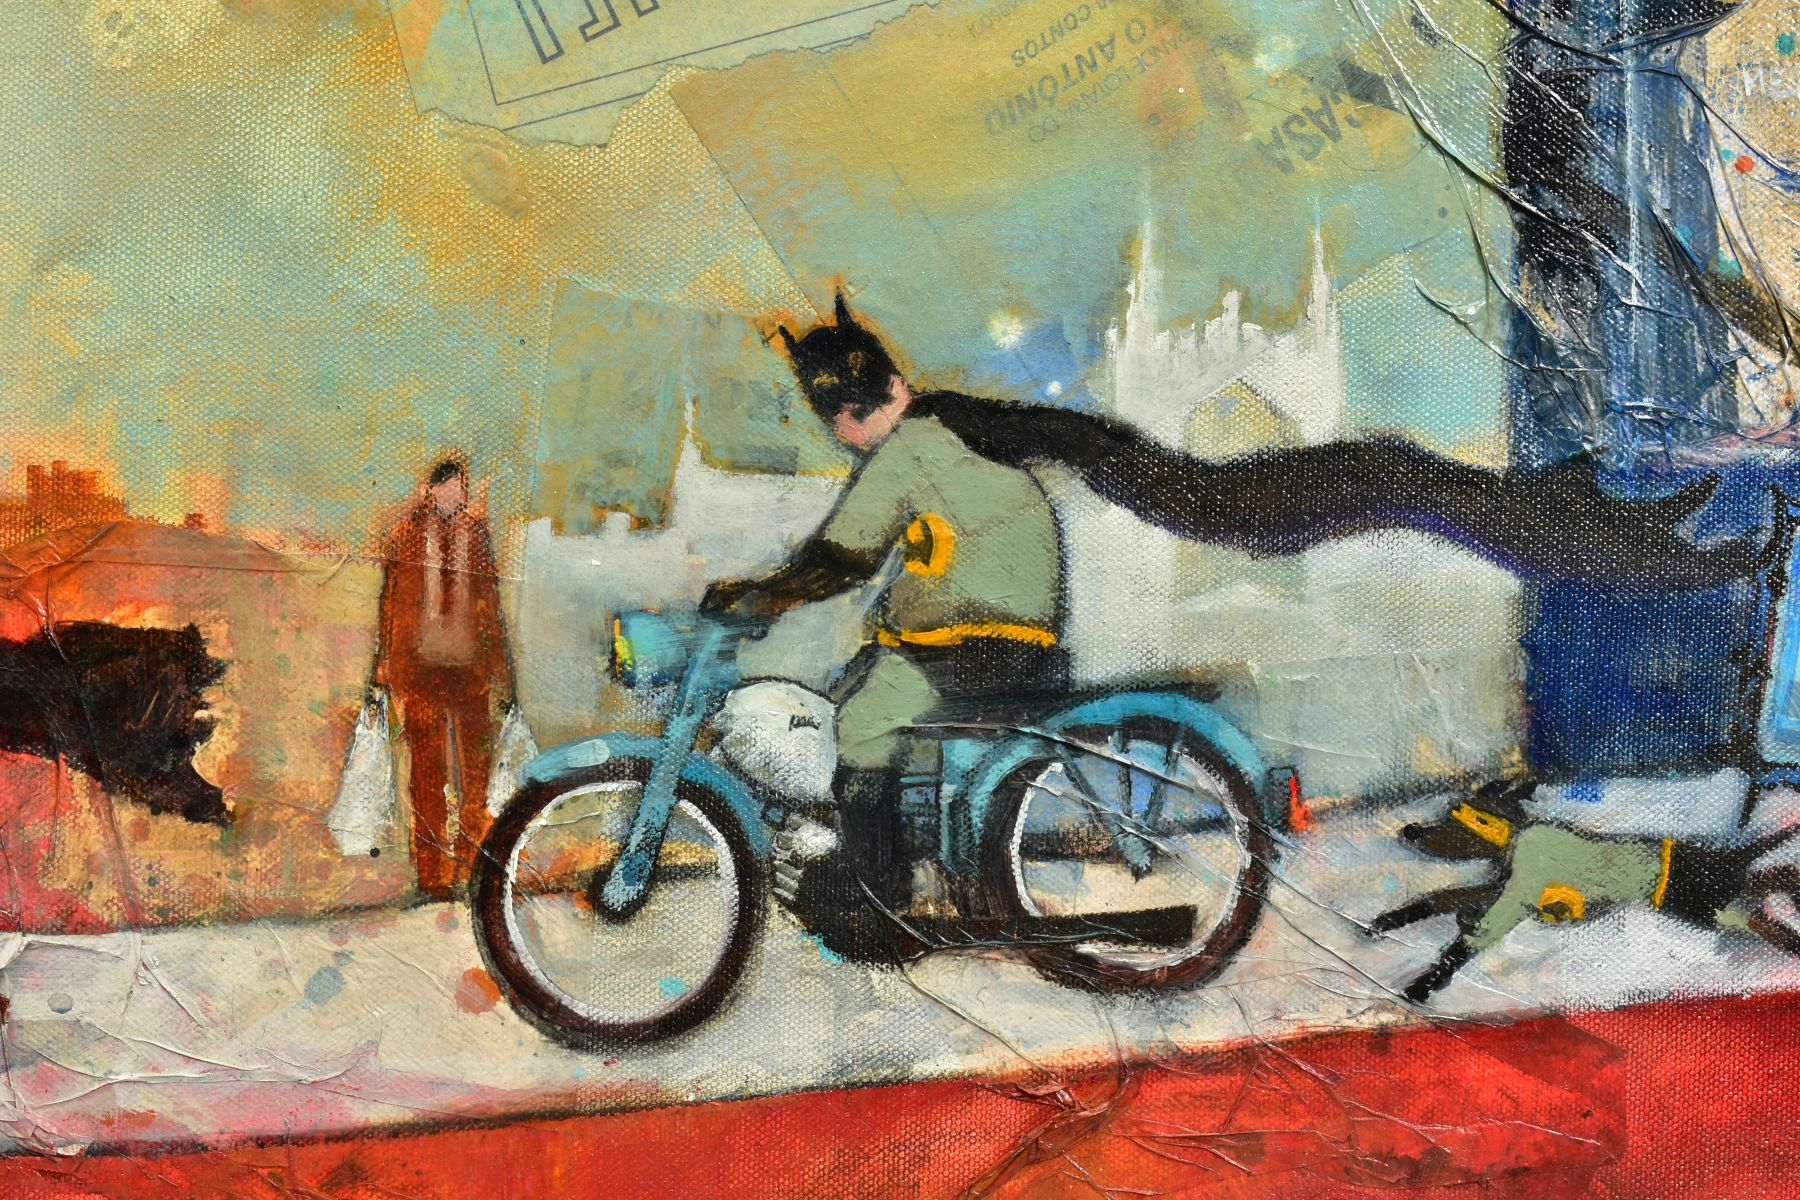 RICHARD BUREL (FRANCE 1974), 'Batman & Robin', the comic super heroes riding mopeds, signed bottom - Image 2 of 6